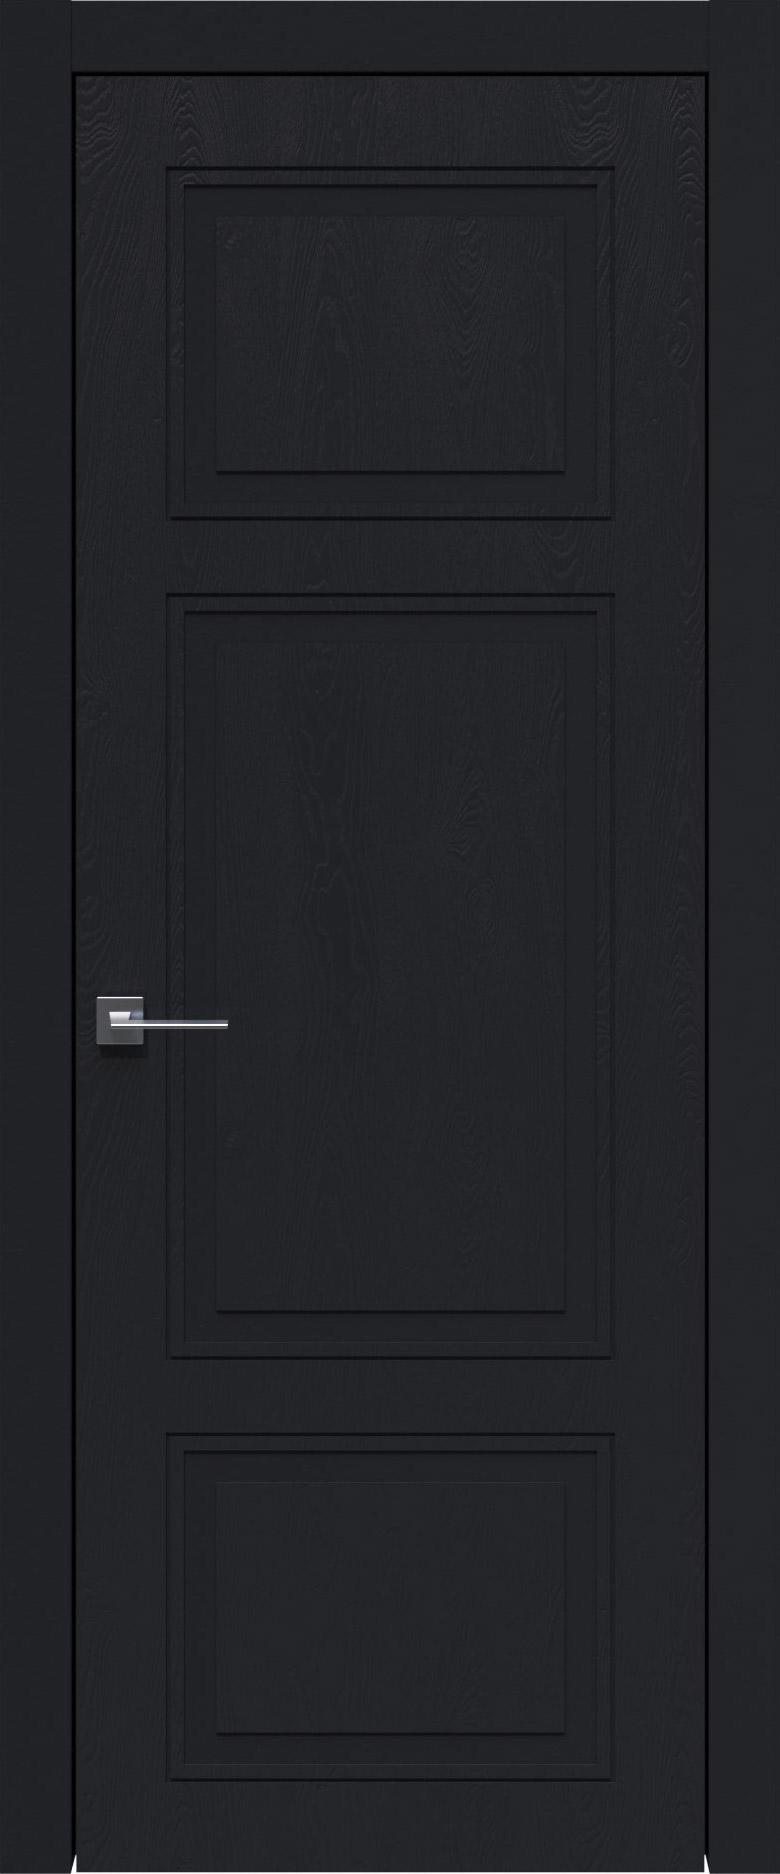 Siena Neo Classic цвет - Черная эмаль по шпону (RAL 9004) Без стекла (ДГ)